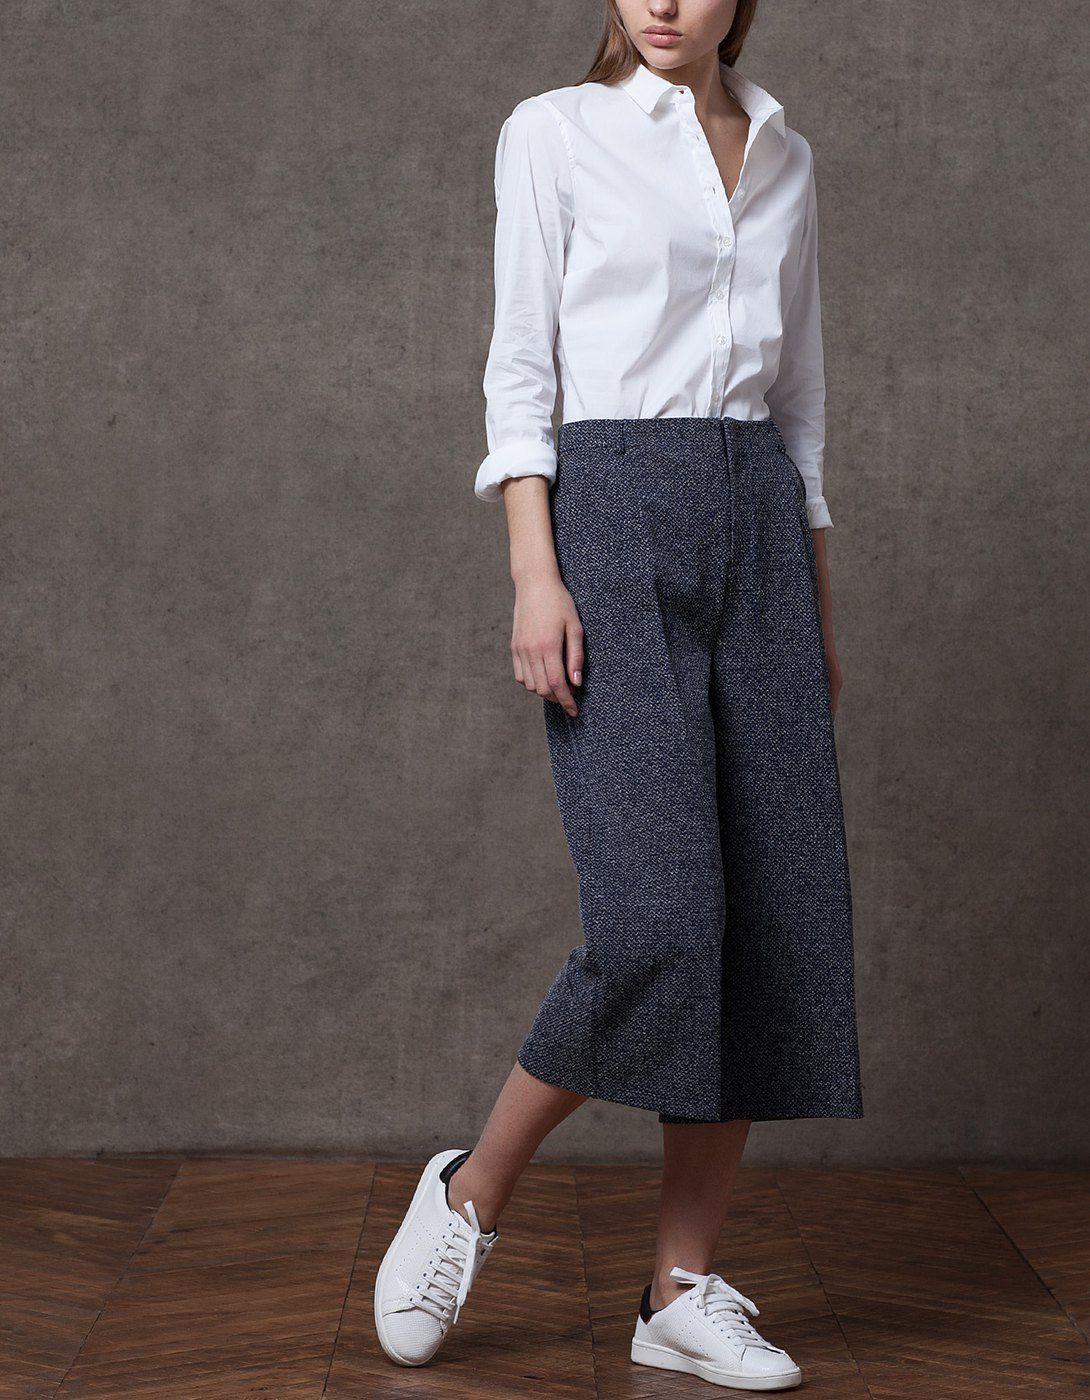 Pantalone culotte struttura – null| Stradivarius Italia – Saldi d'inverno